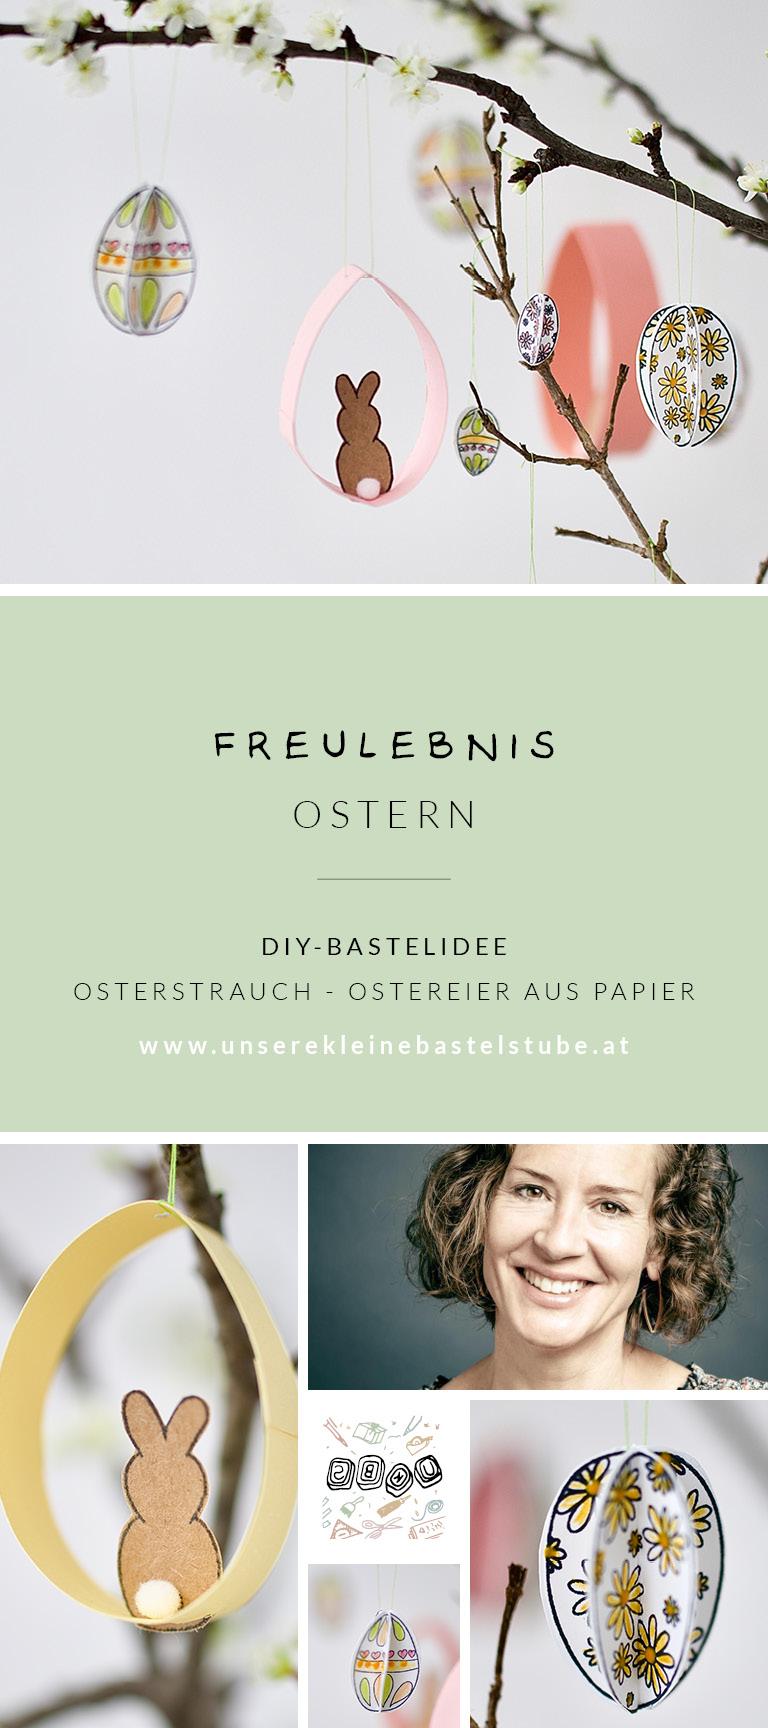 osterstrauch-ostereier aus papier